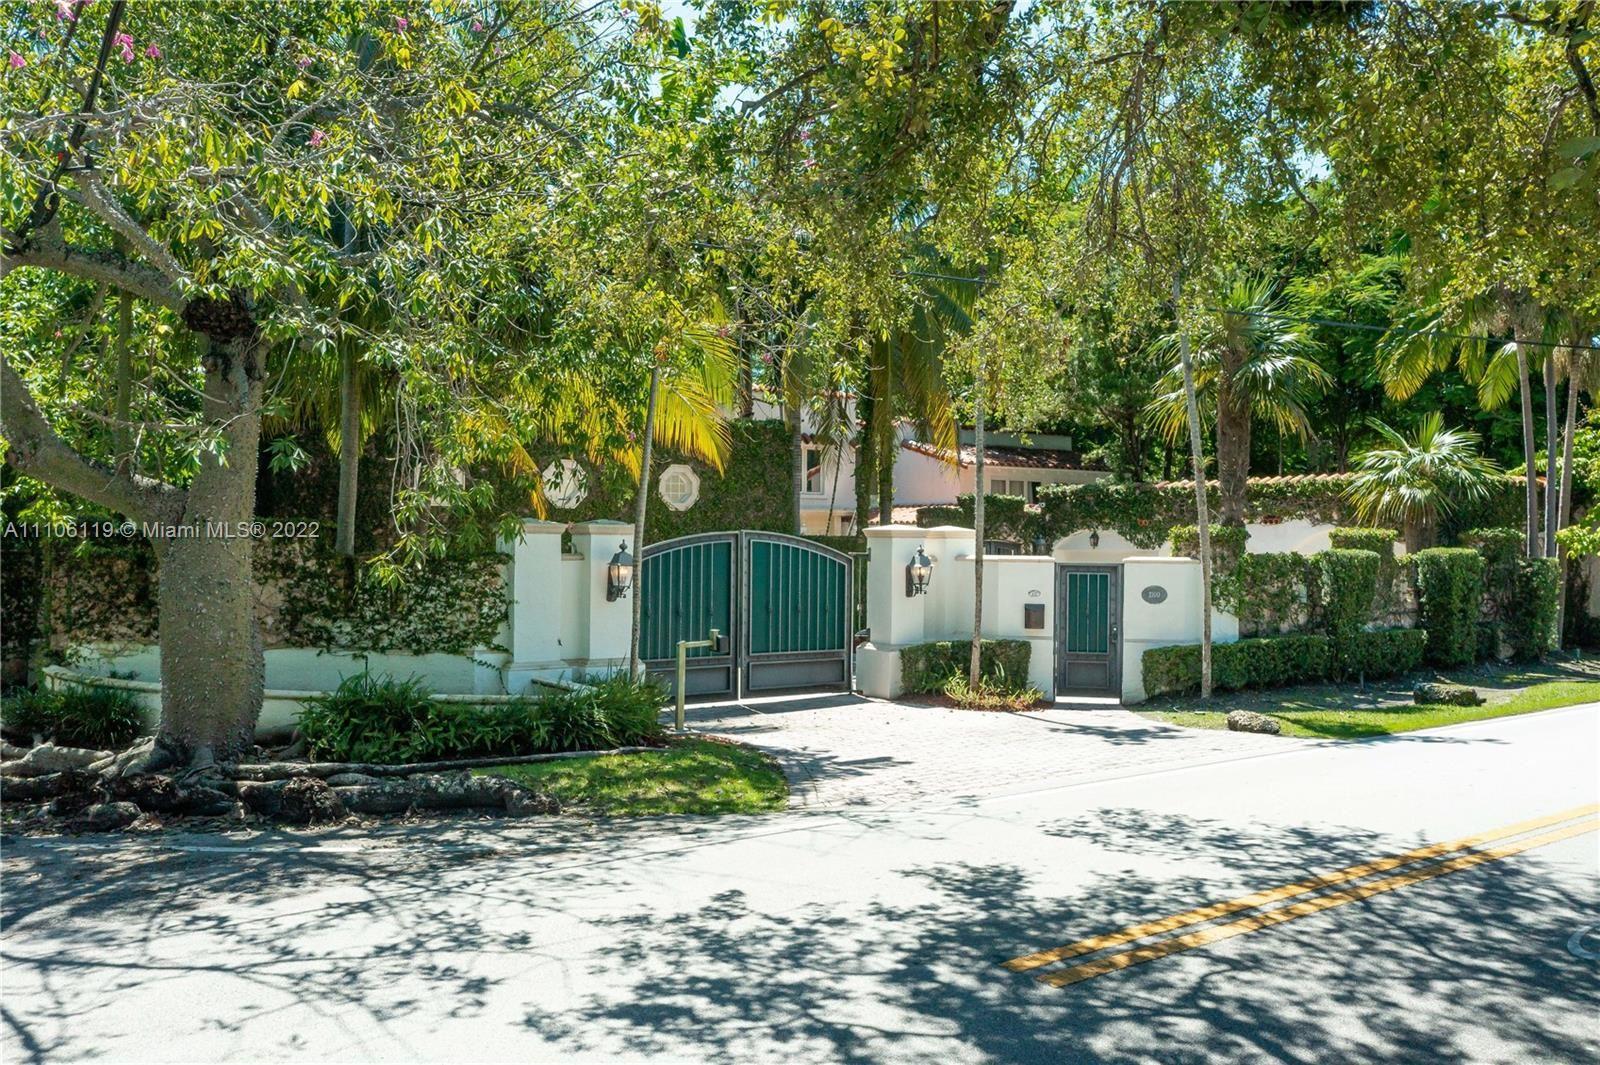 2100 Tigertail Ave, Miami, FL 33133 - #: A11106119